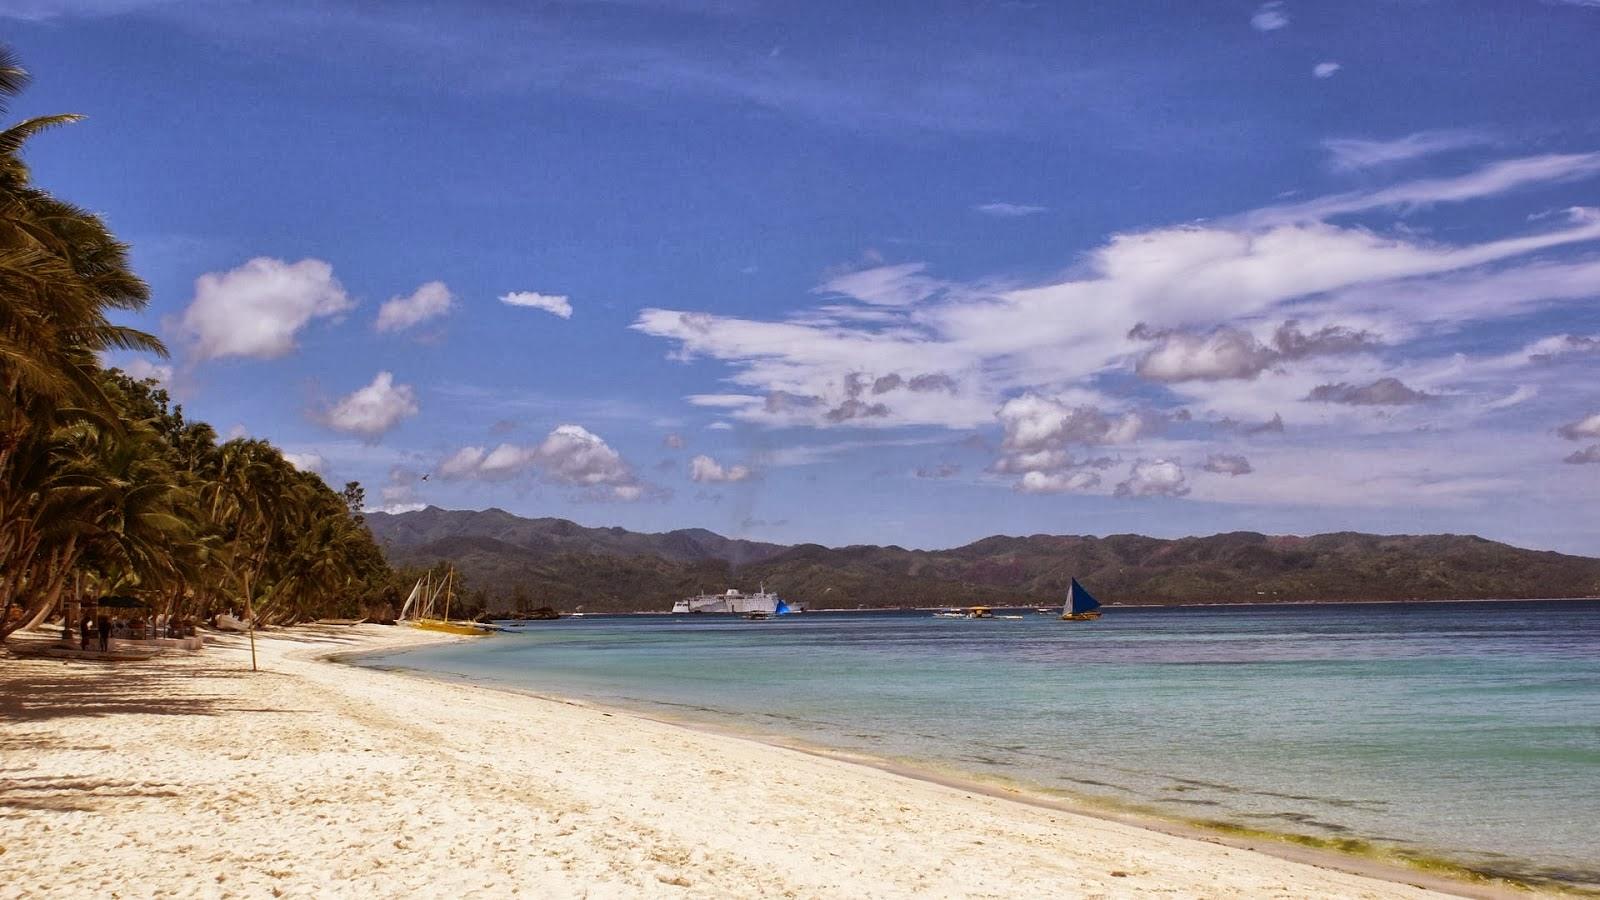 Hd beach wallpapers 1080p wallpapersafari - Beach hd wallpapers 1080p ...